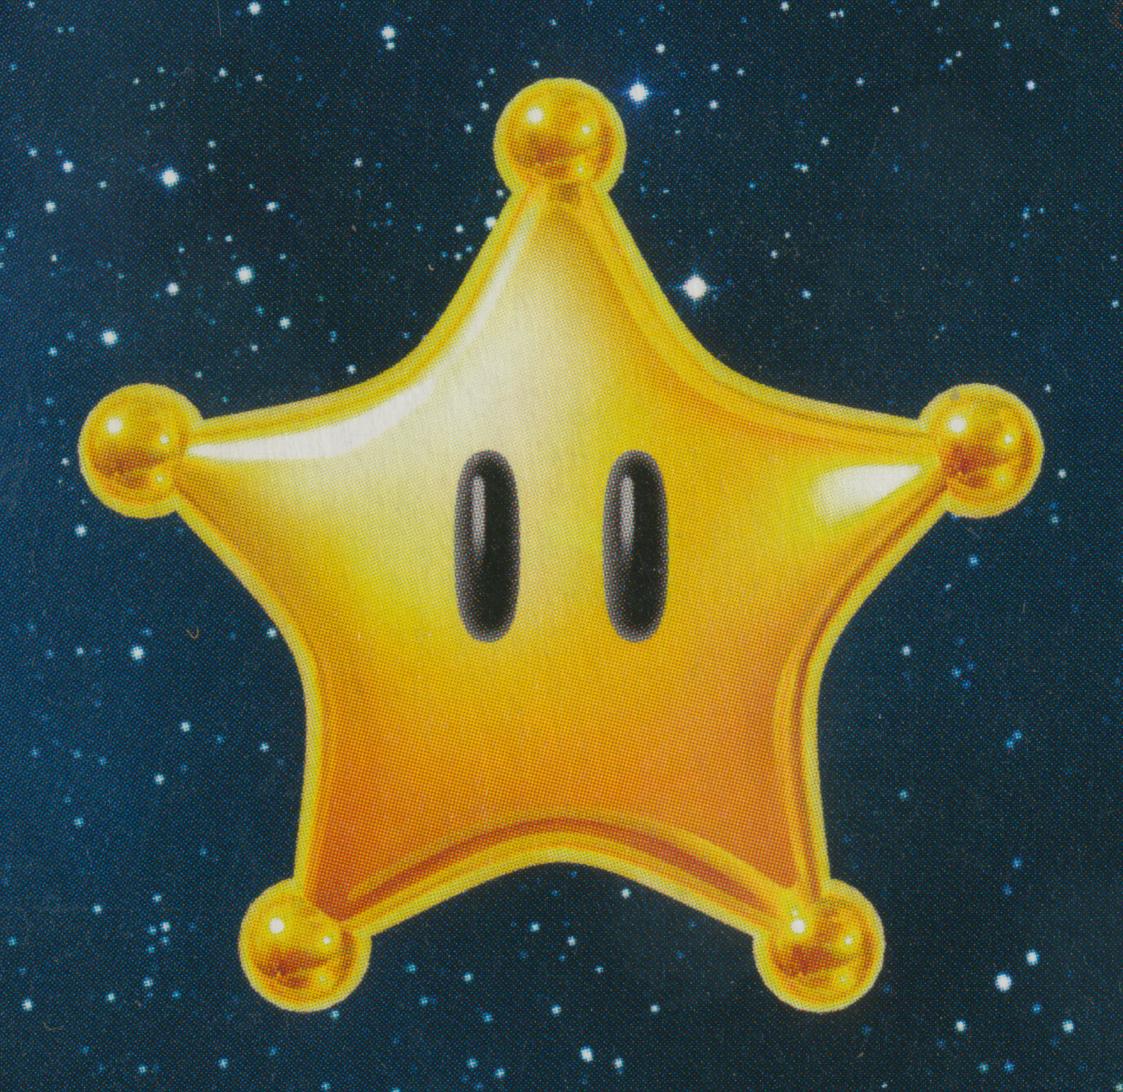 mario galaxy star buddy - photo #1